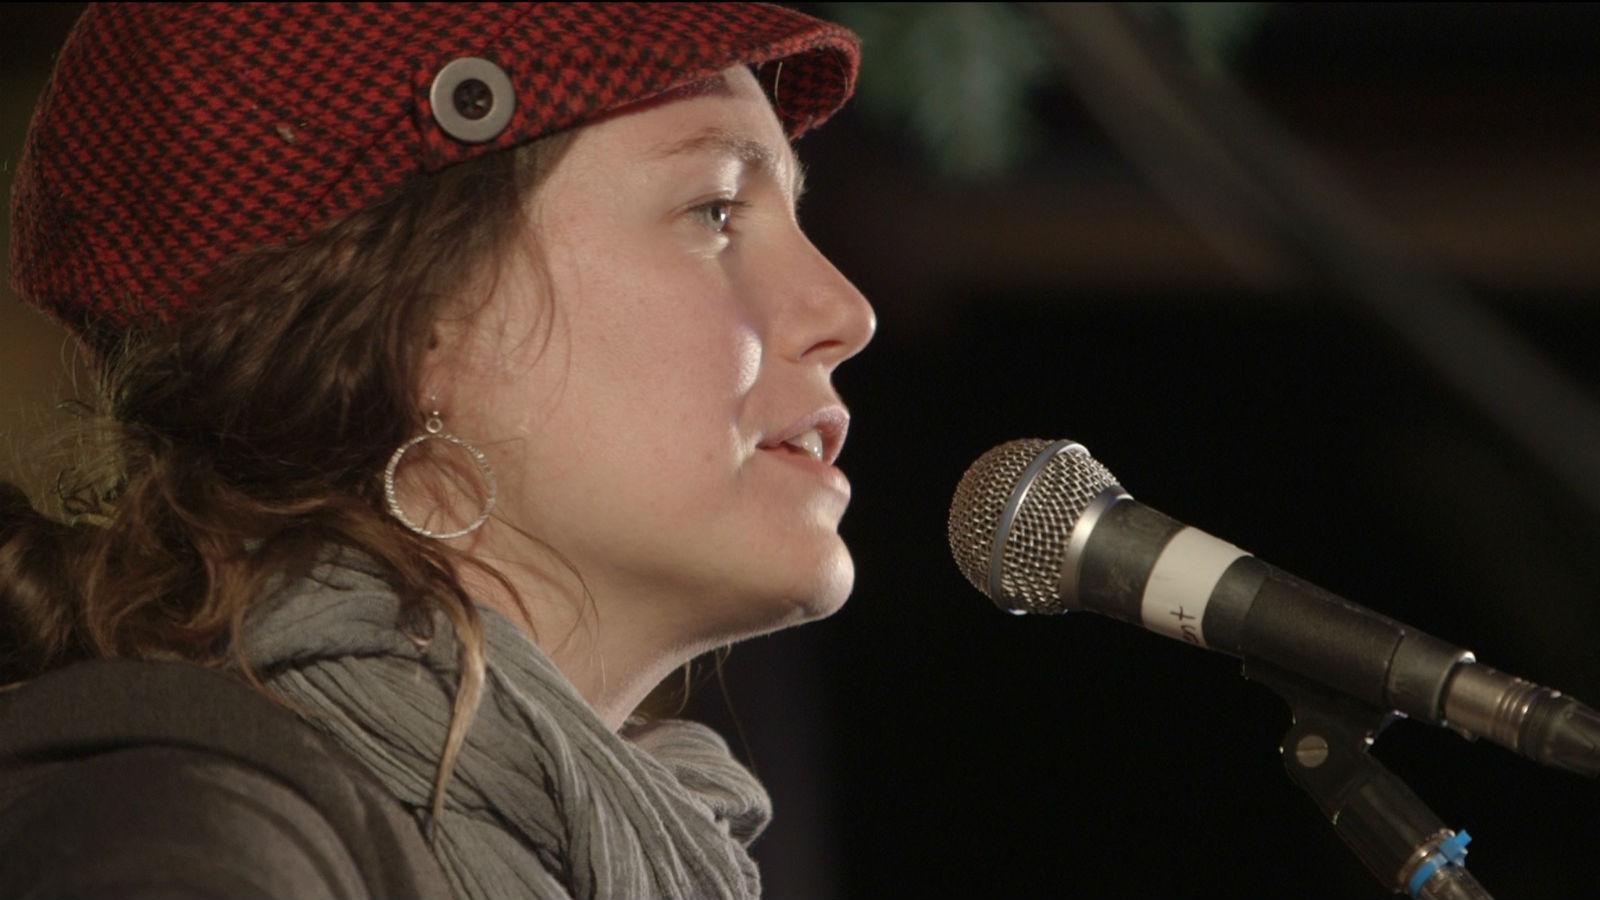 Catherine MacLellan in concert.